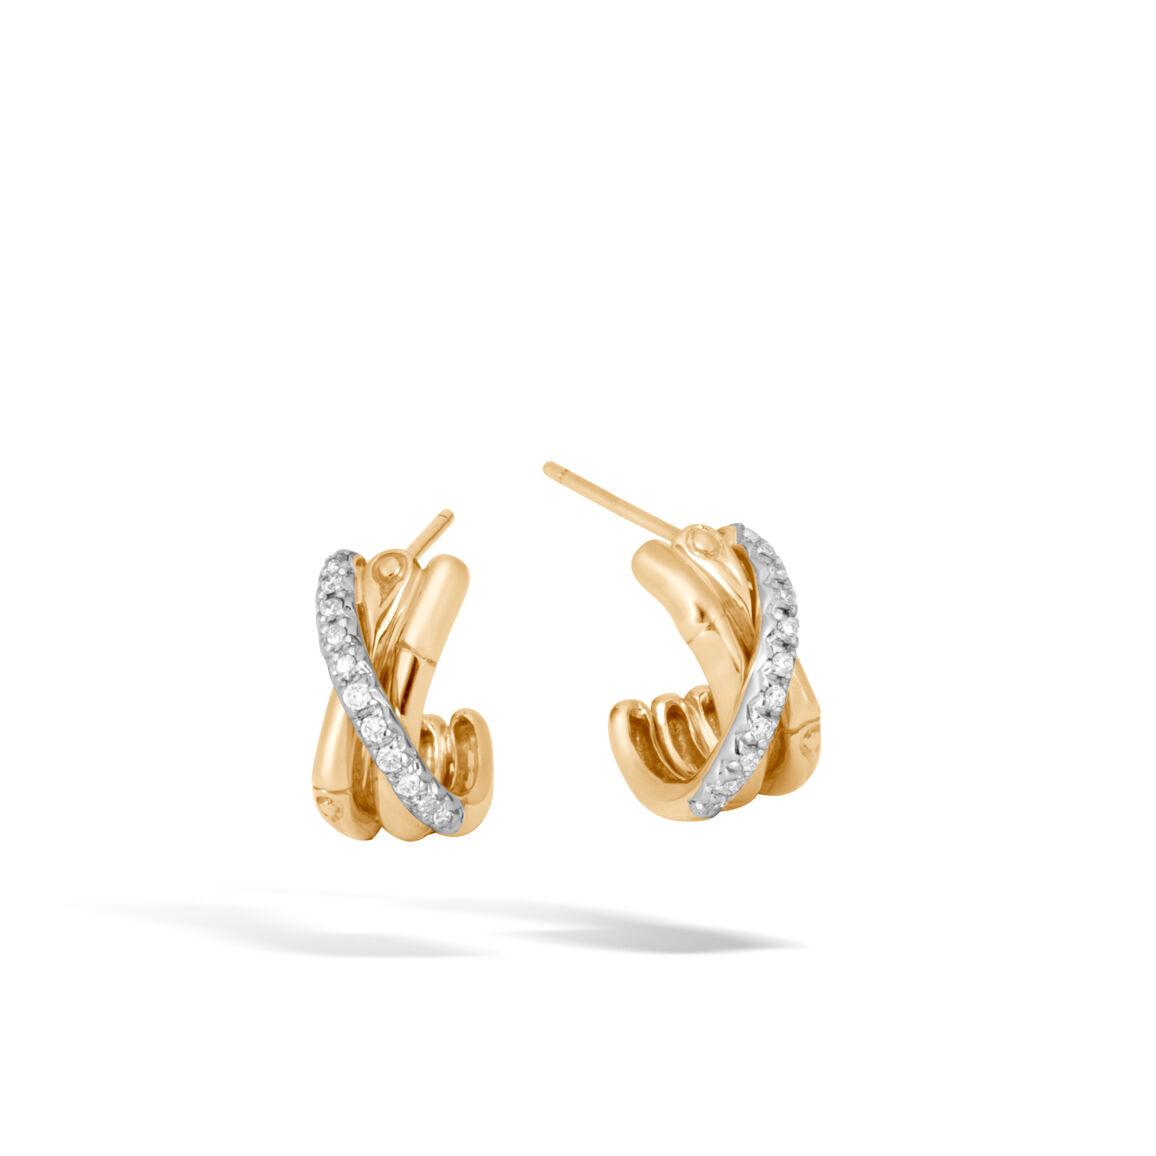 Bamboo J Hoop Earring in 18K Gold with Diamonds